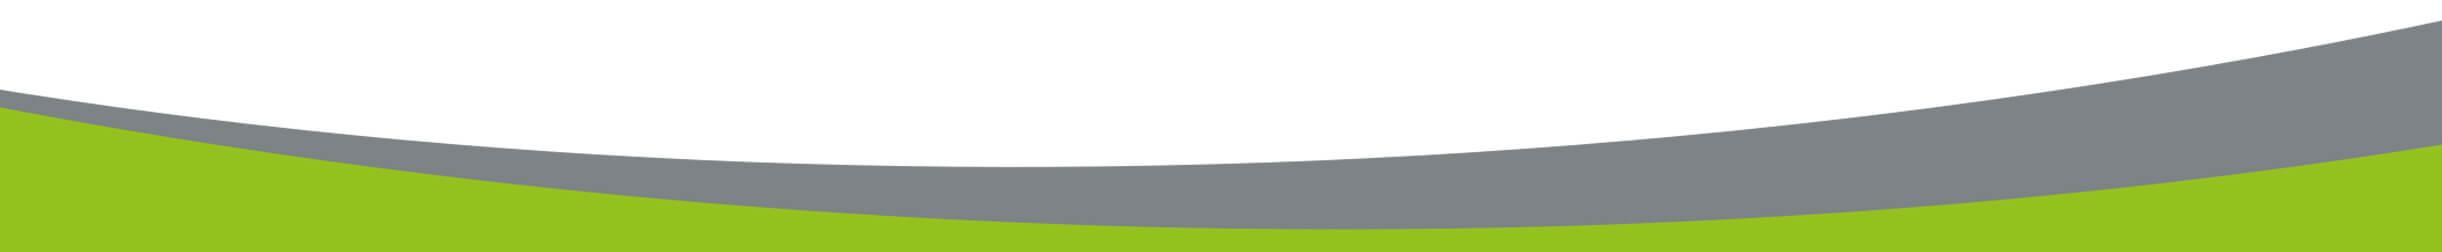 light green curve